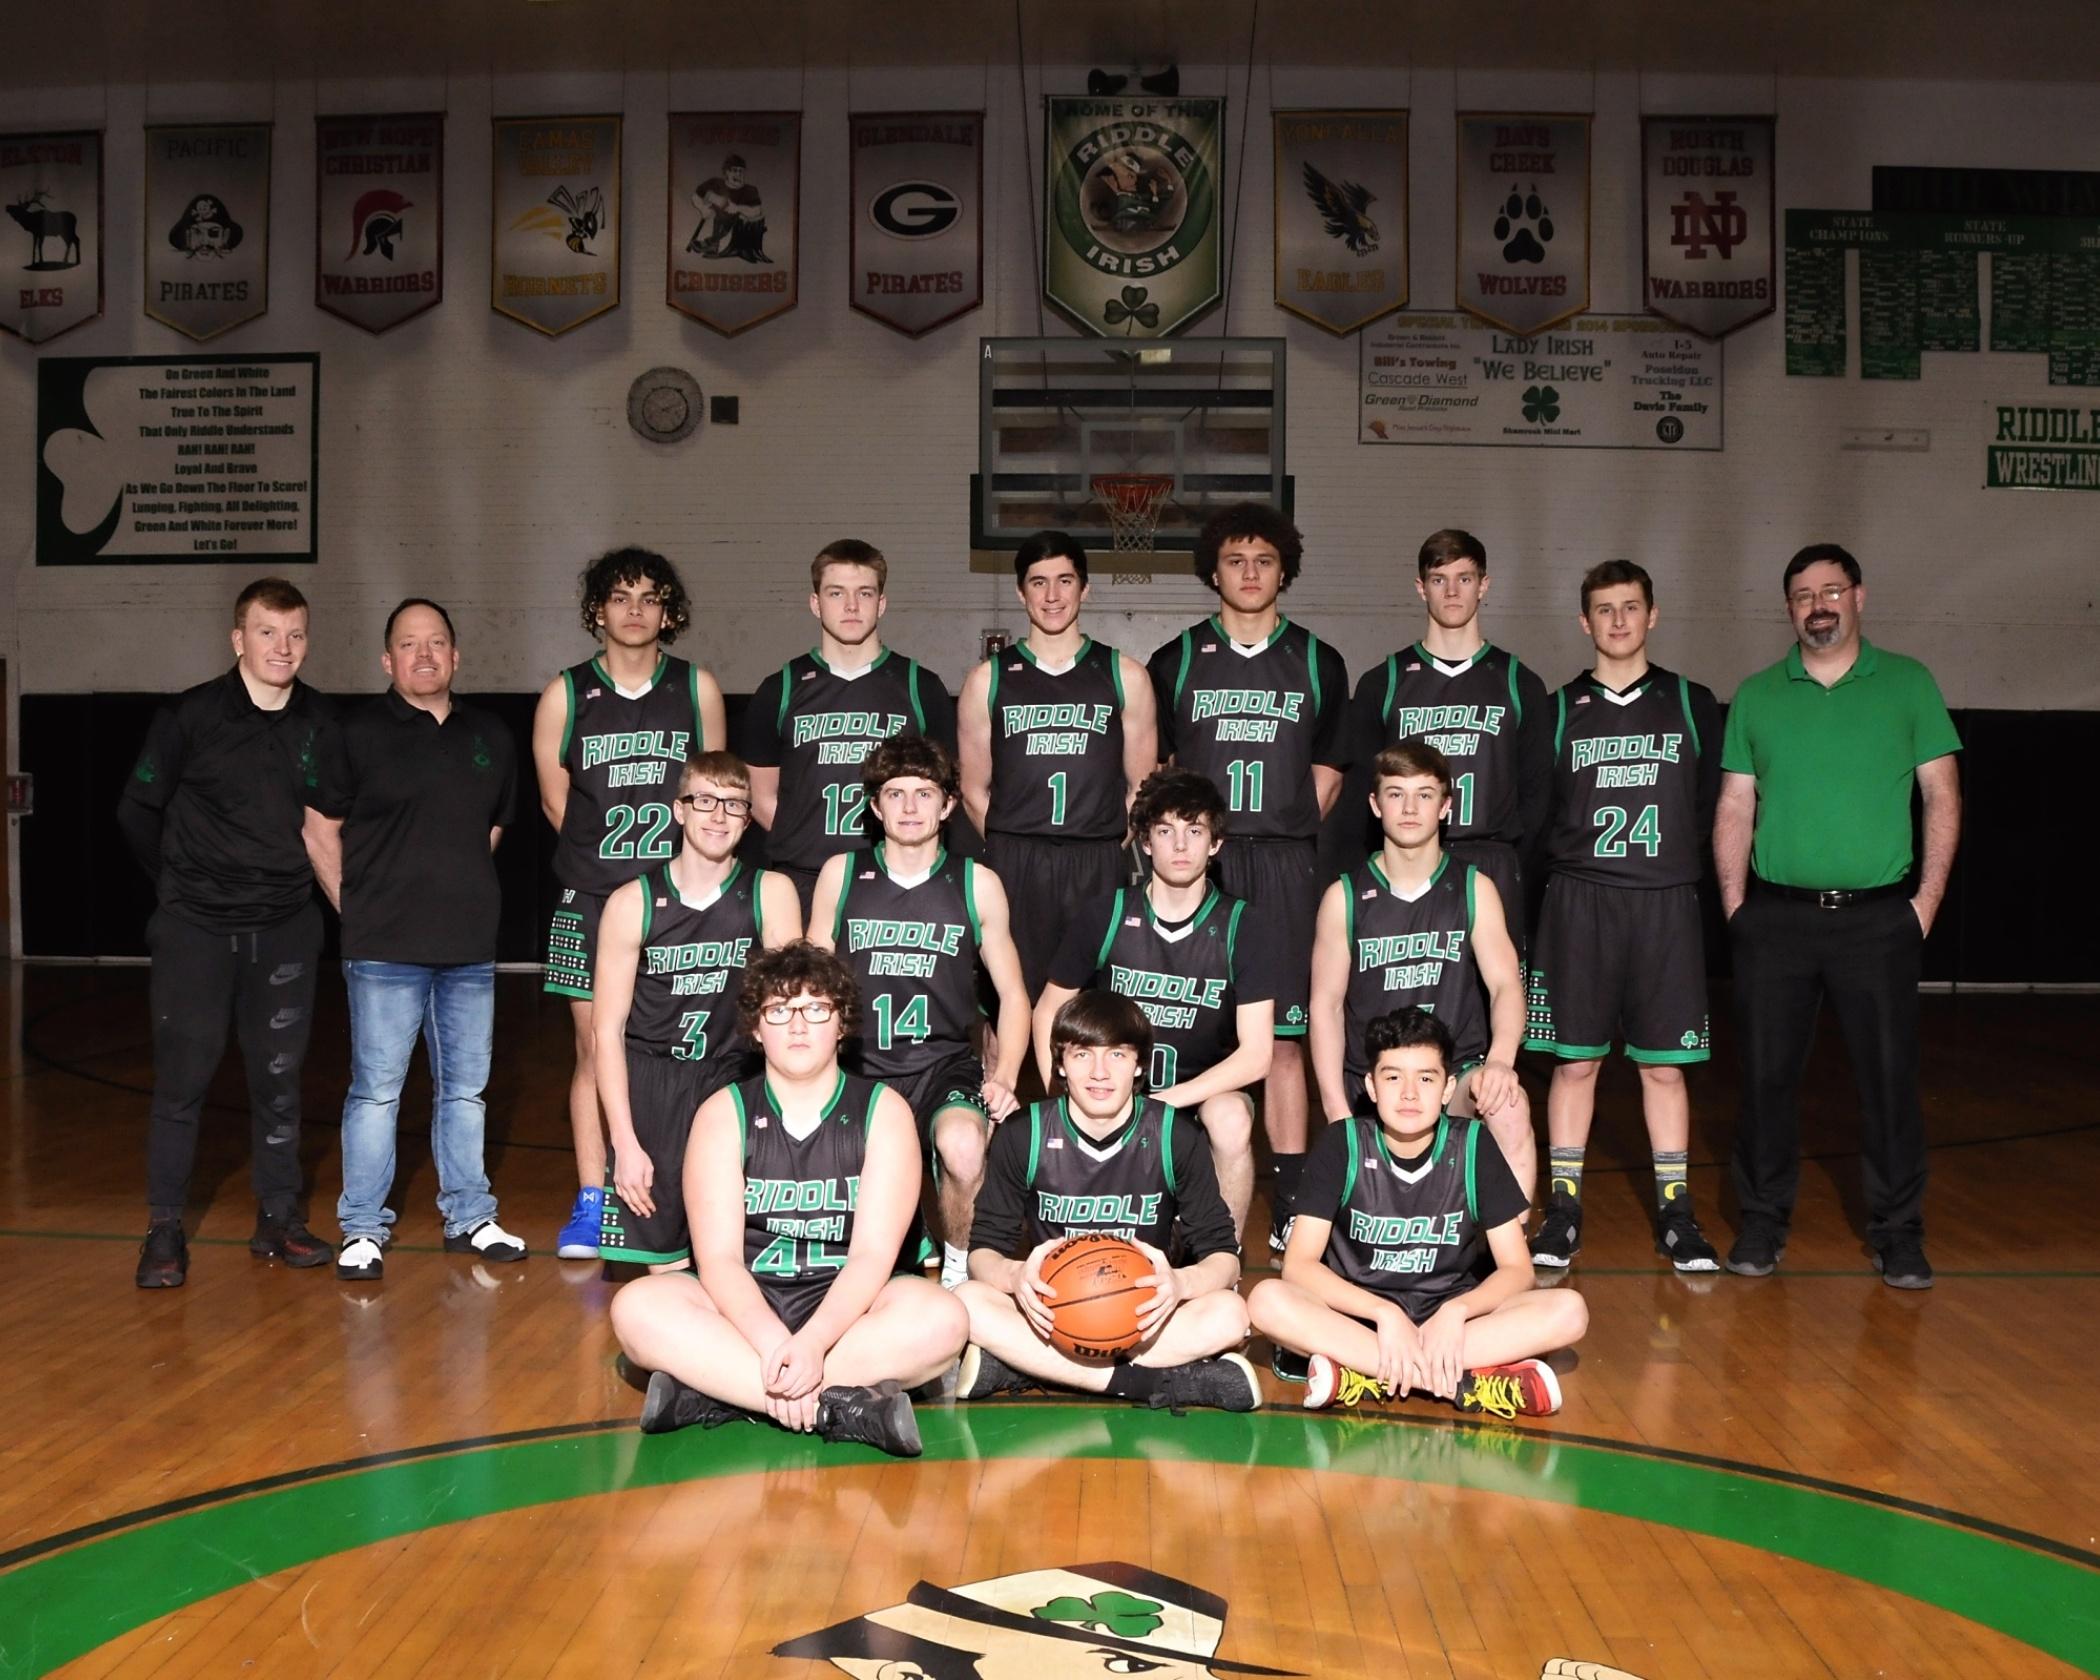 Riddle High School boys basketball team photo.